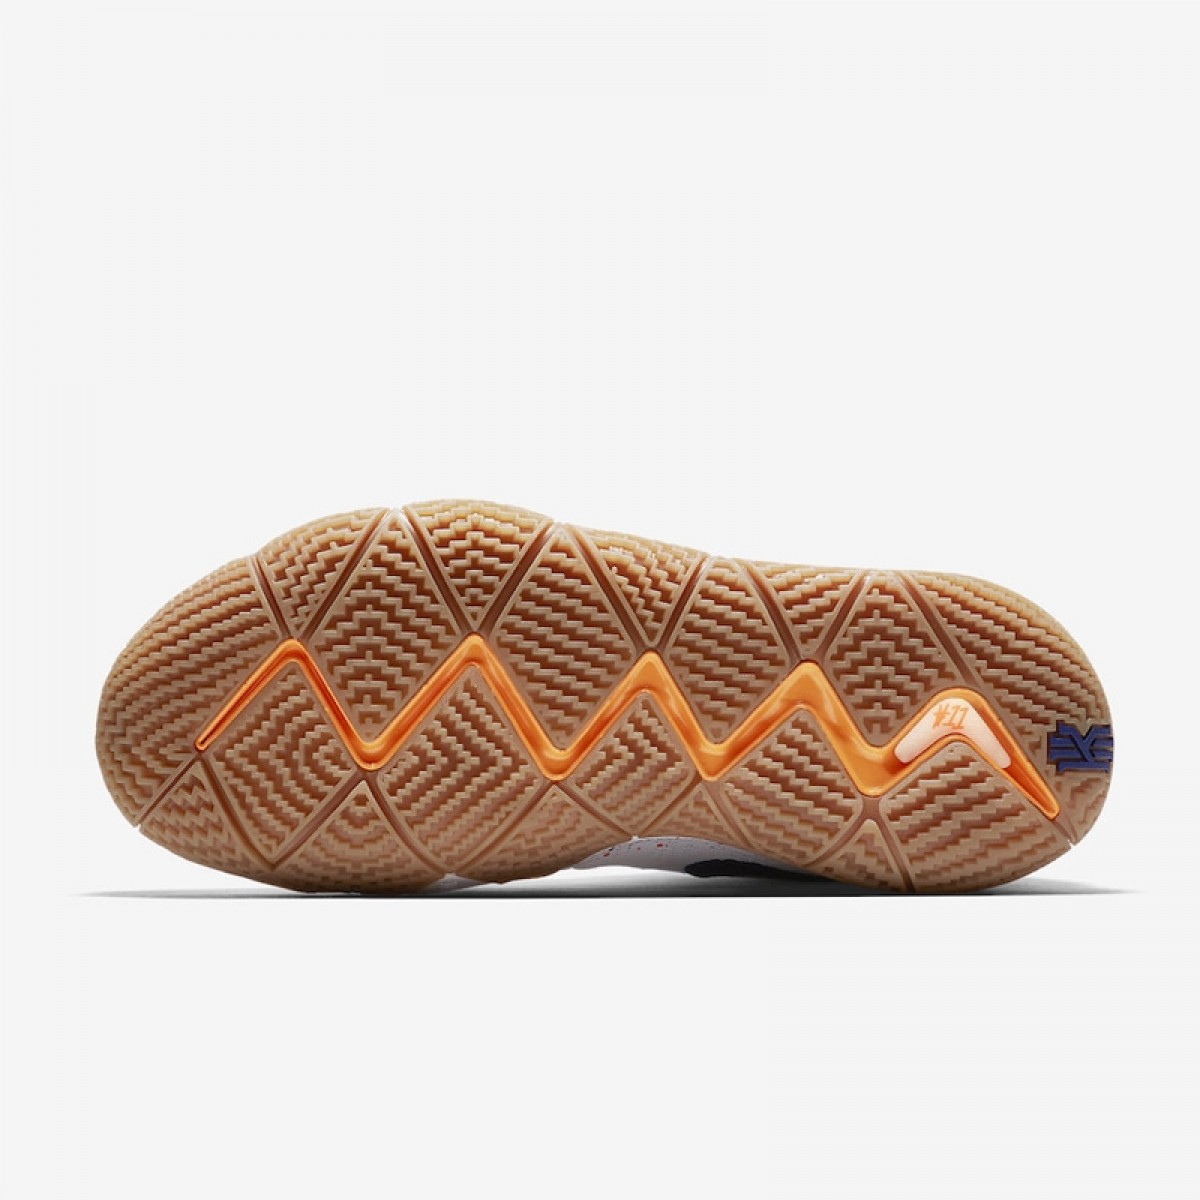 Nike Kyrie 4 'Uncle Drew' 943806-100